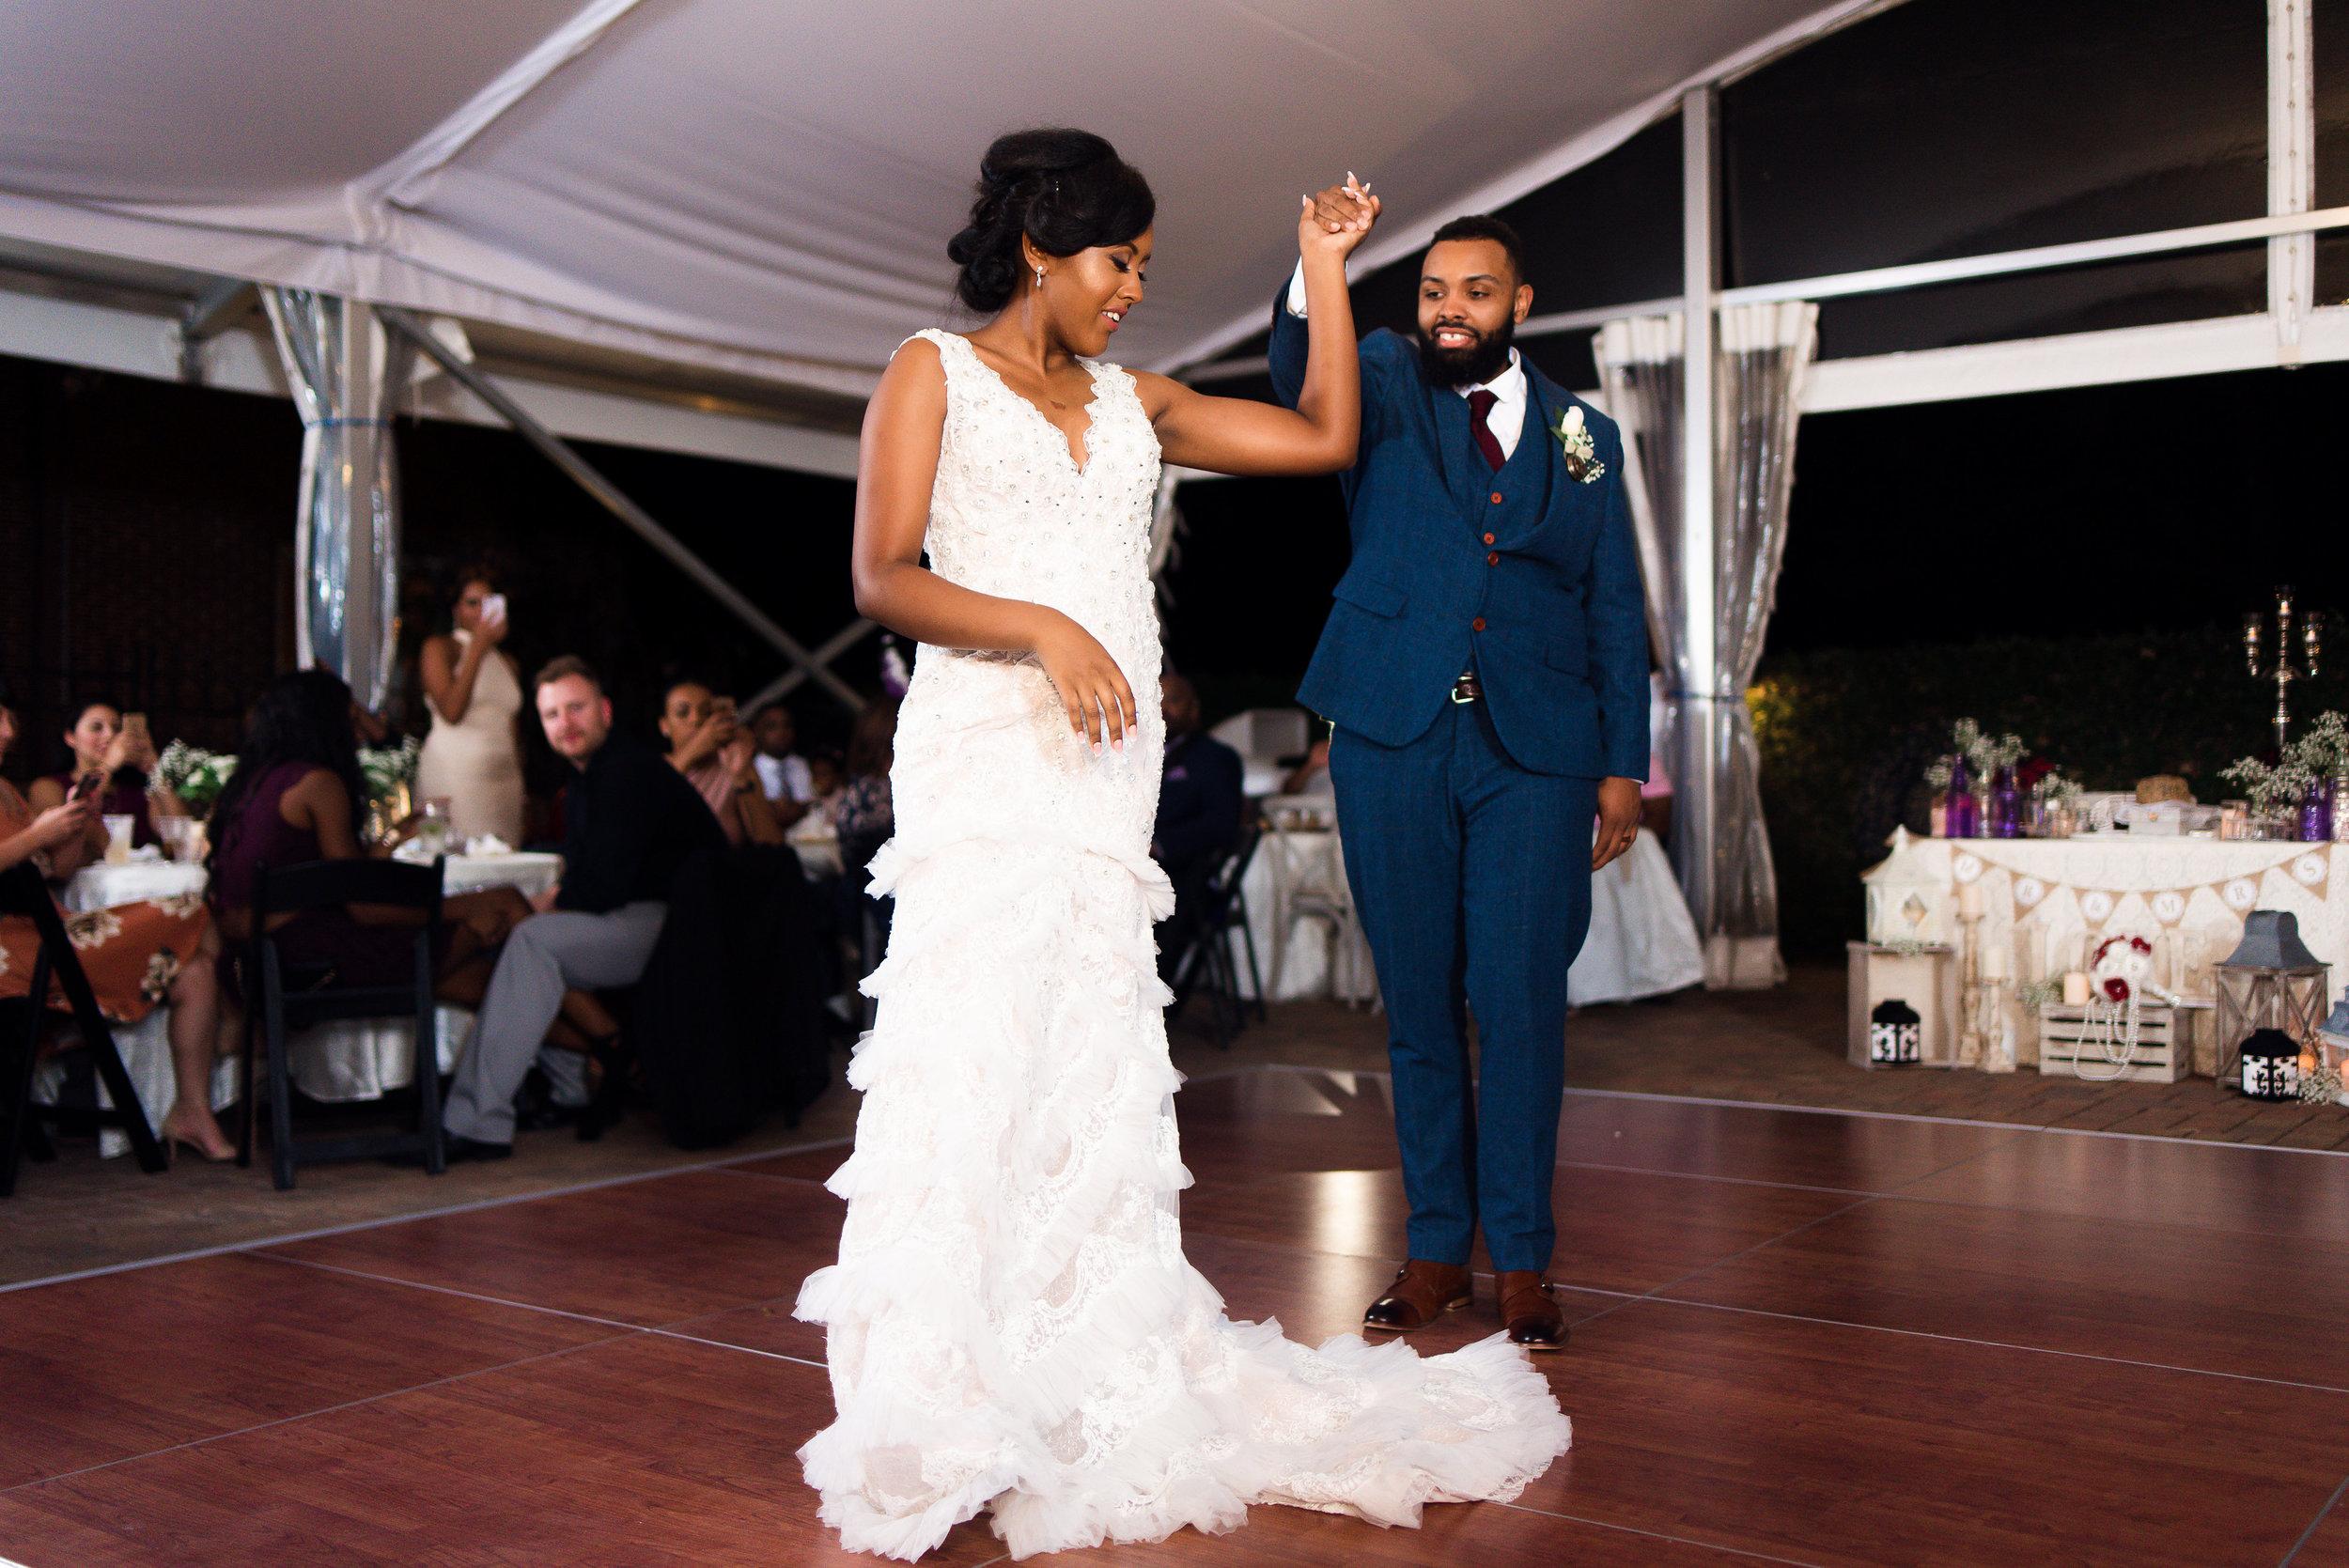 TC-Jessica-Garr-Pharris-Photography-Real-Wedding-42.jpg